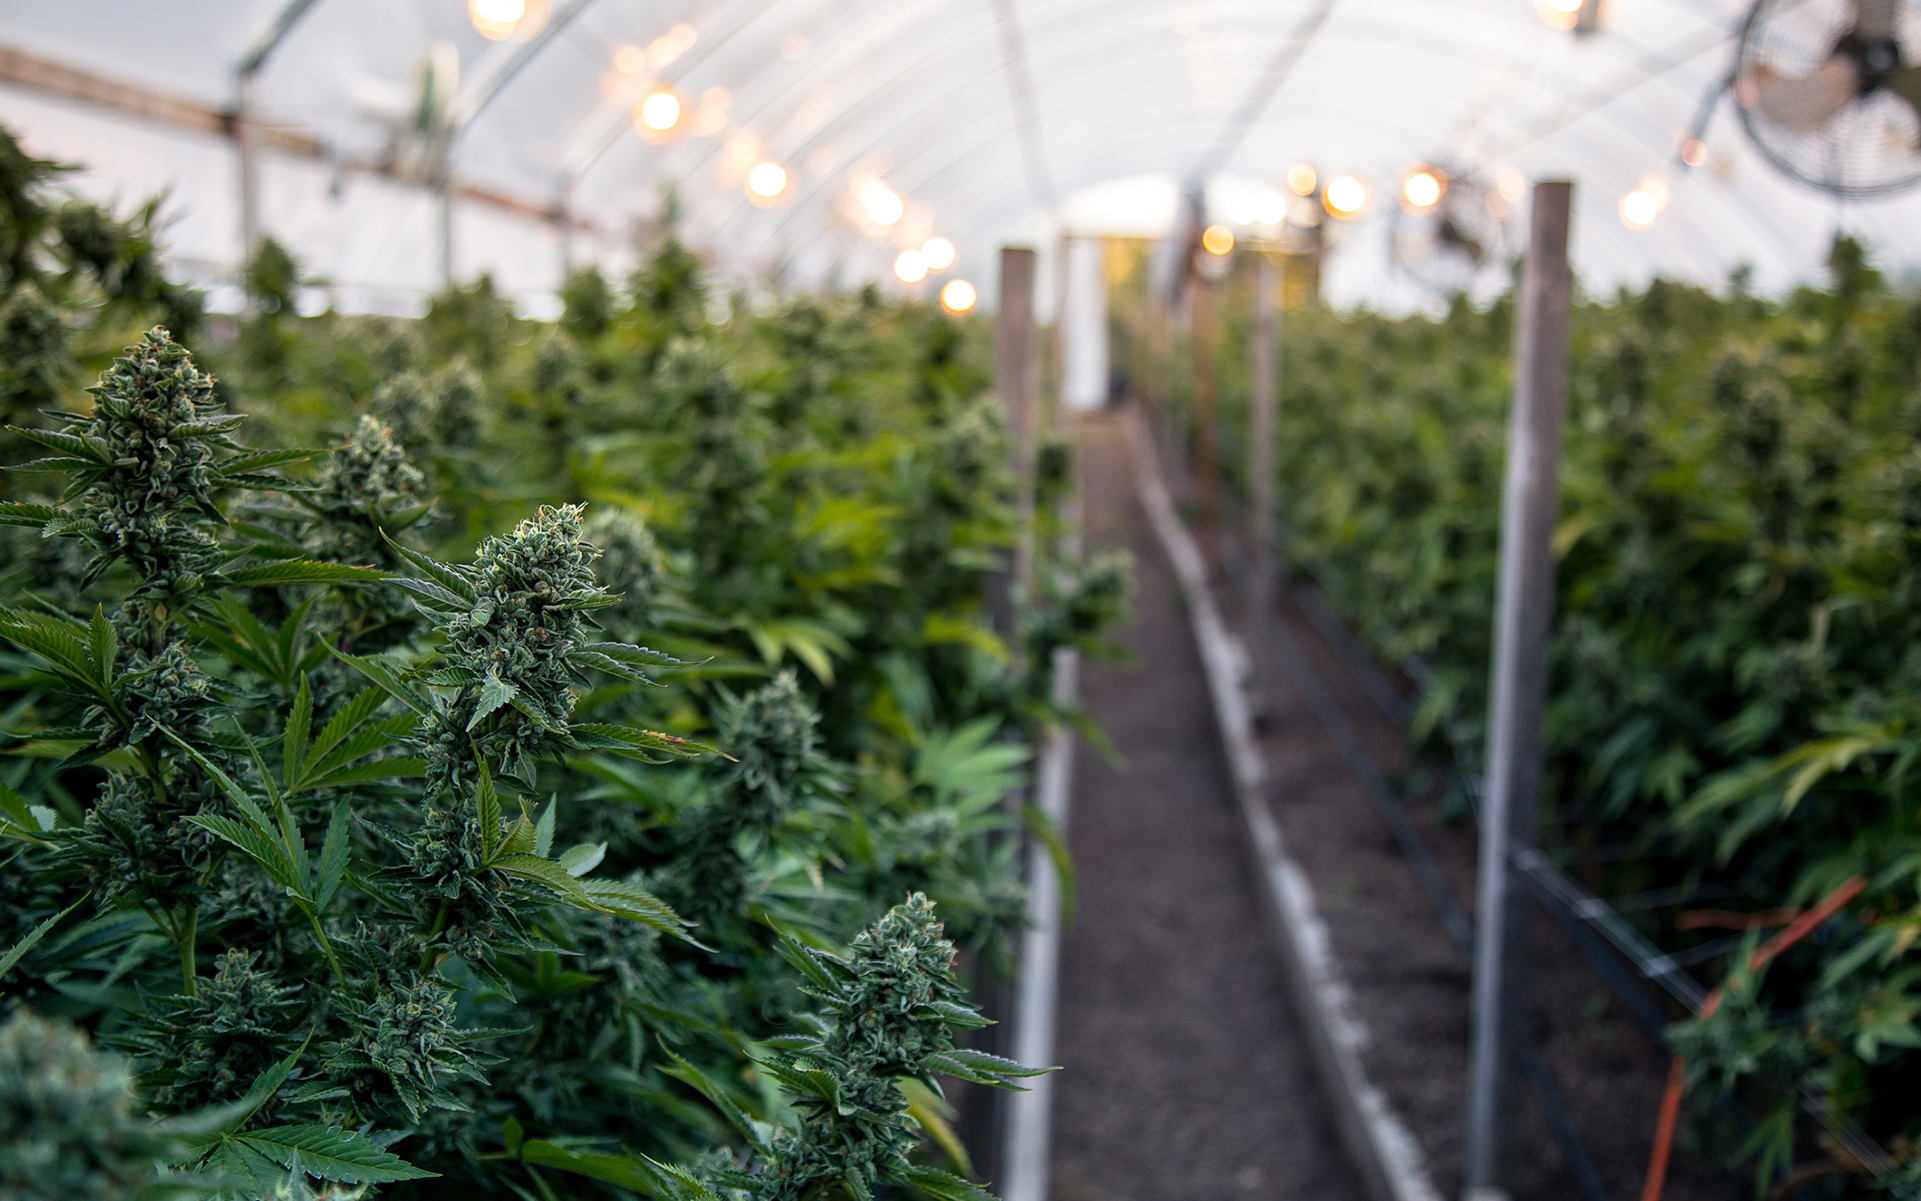 greenhouse-cannabis-grow